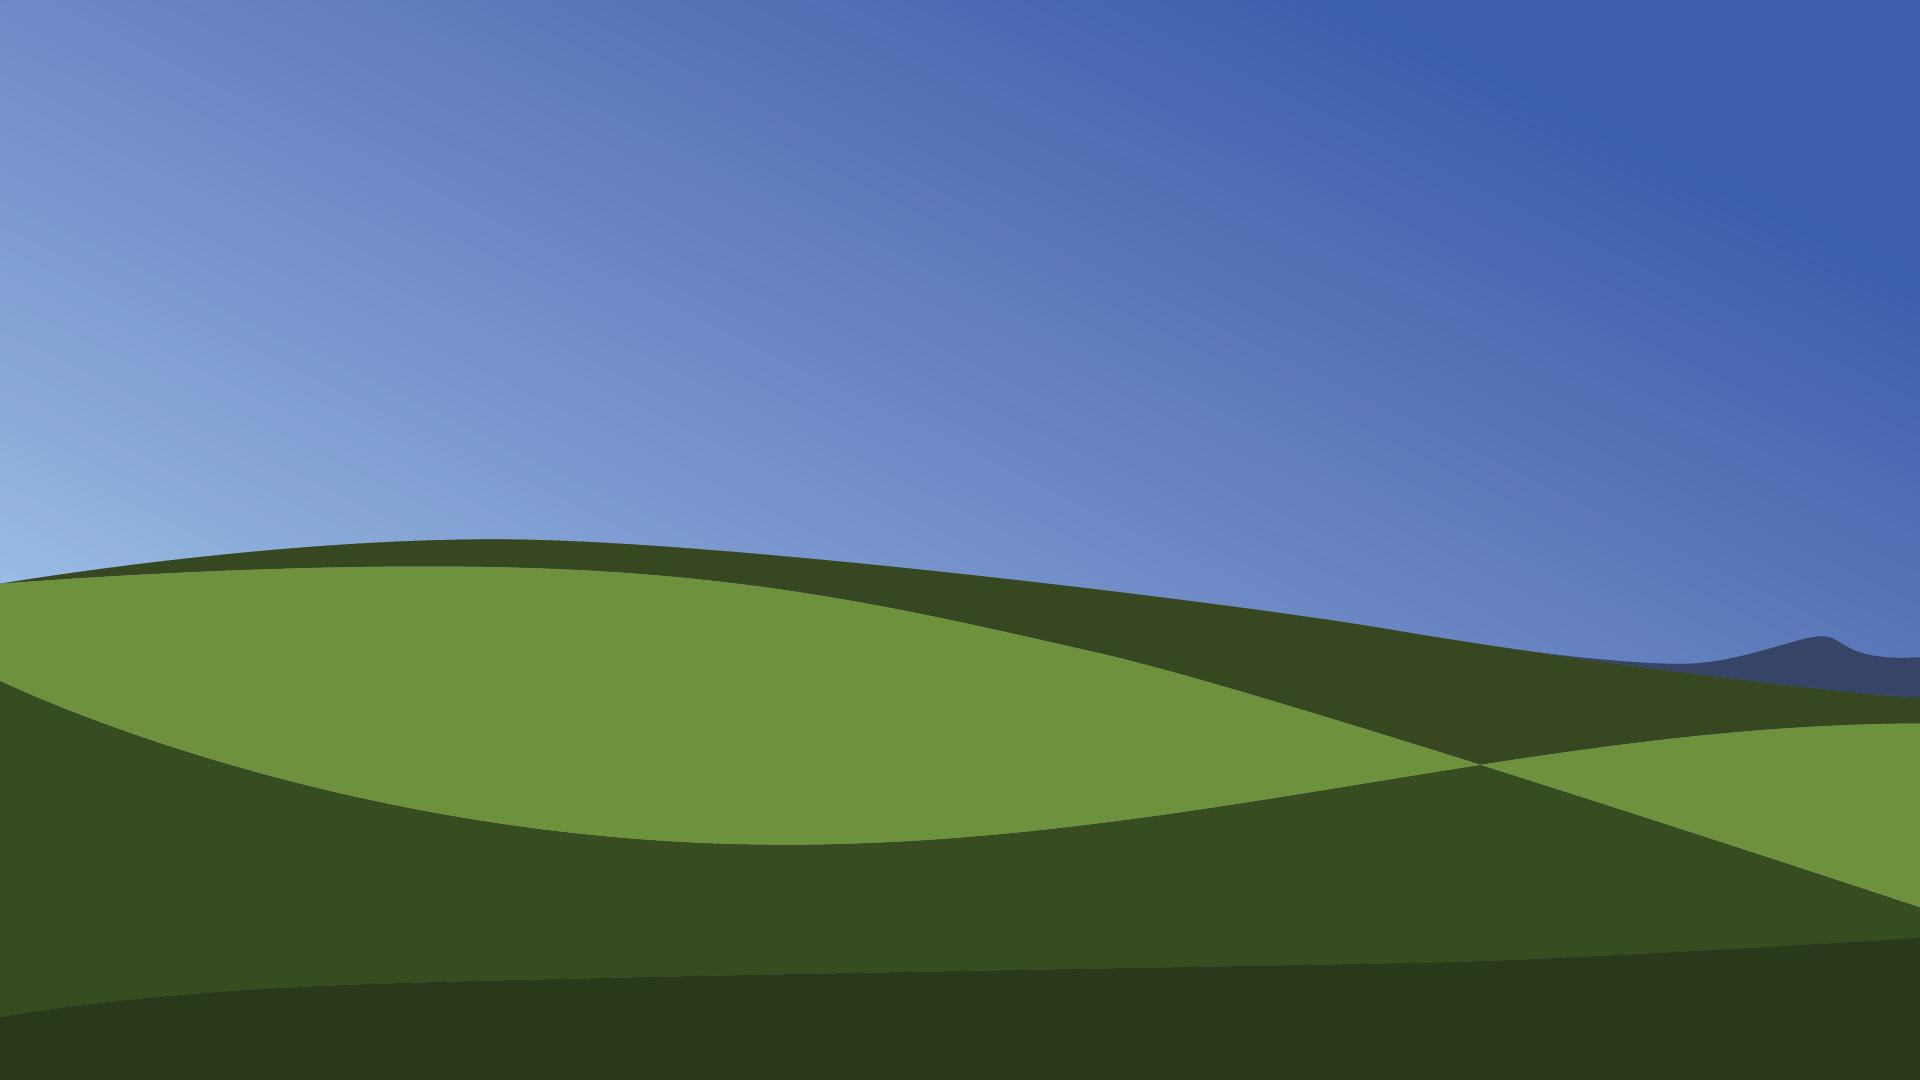 Windows Xp Desktop Wallpaper 41 Pictures